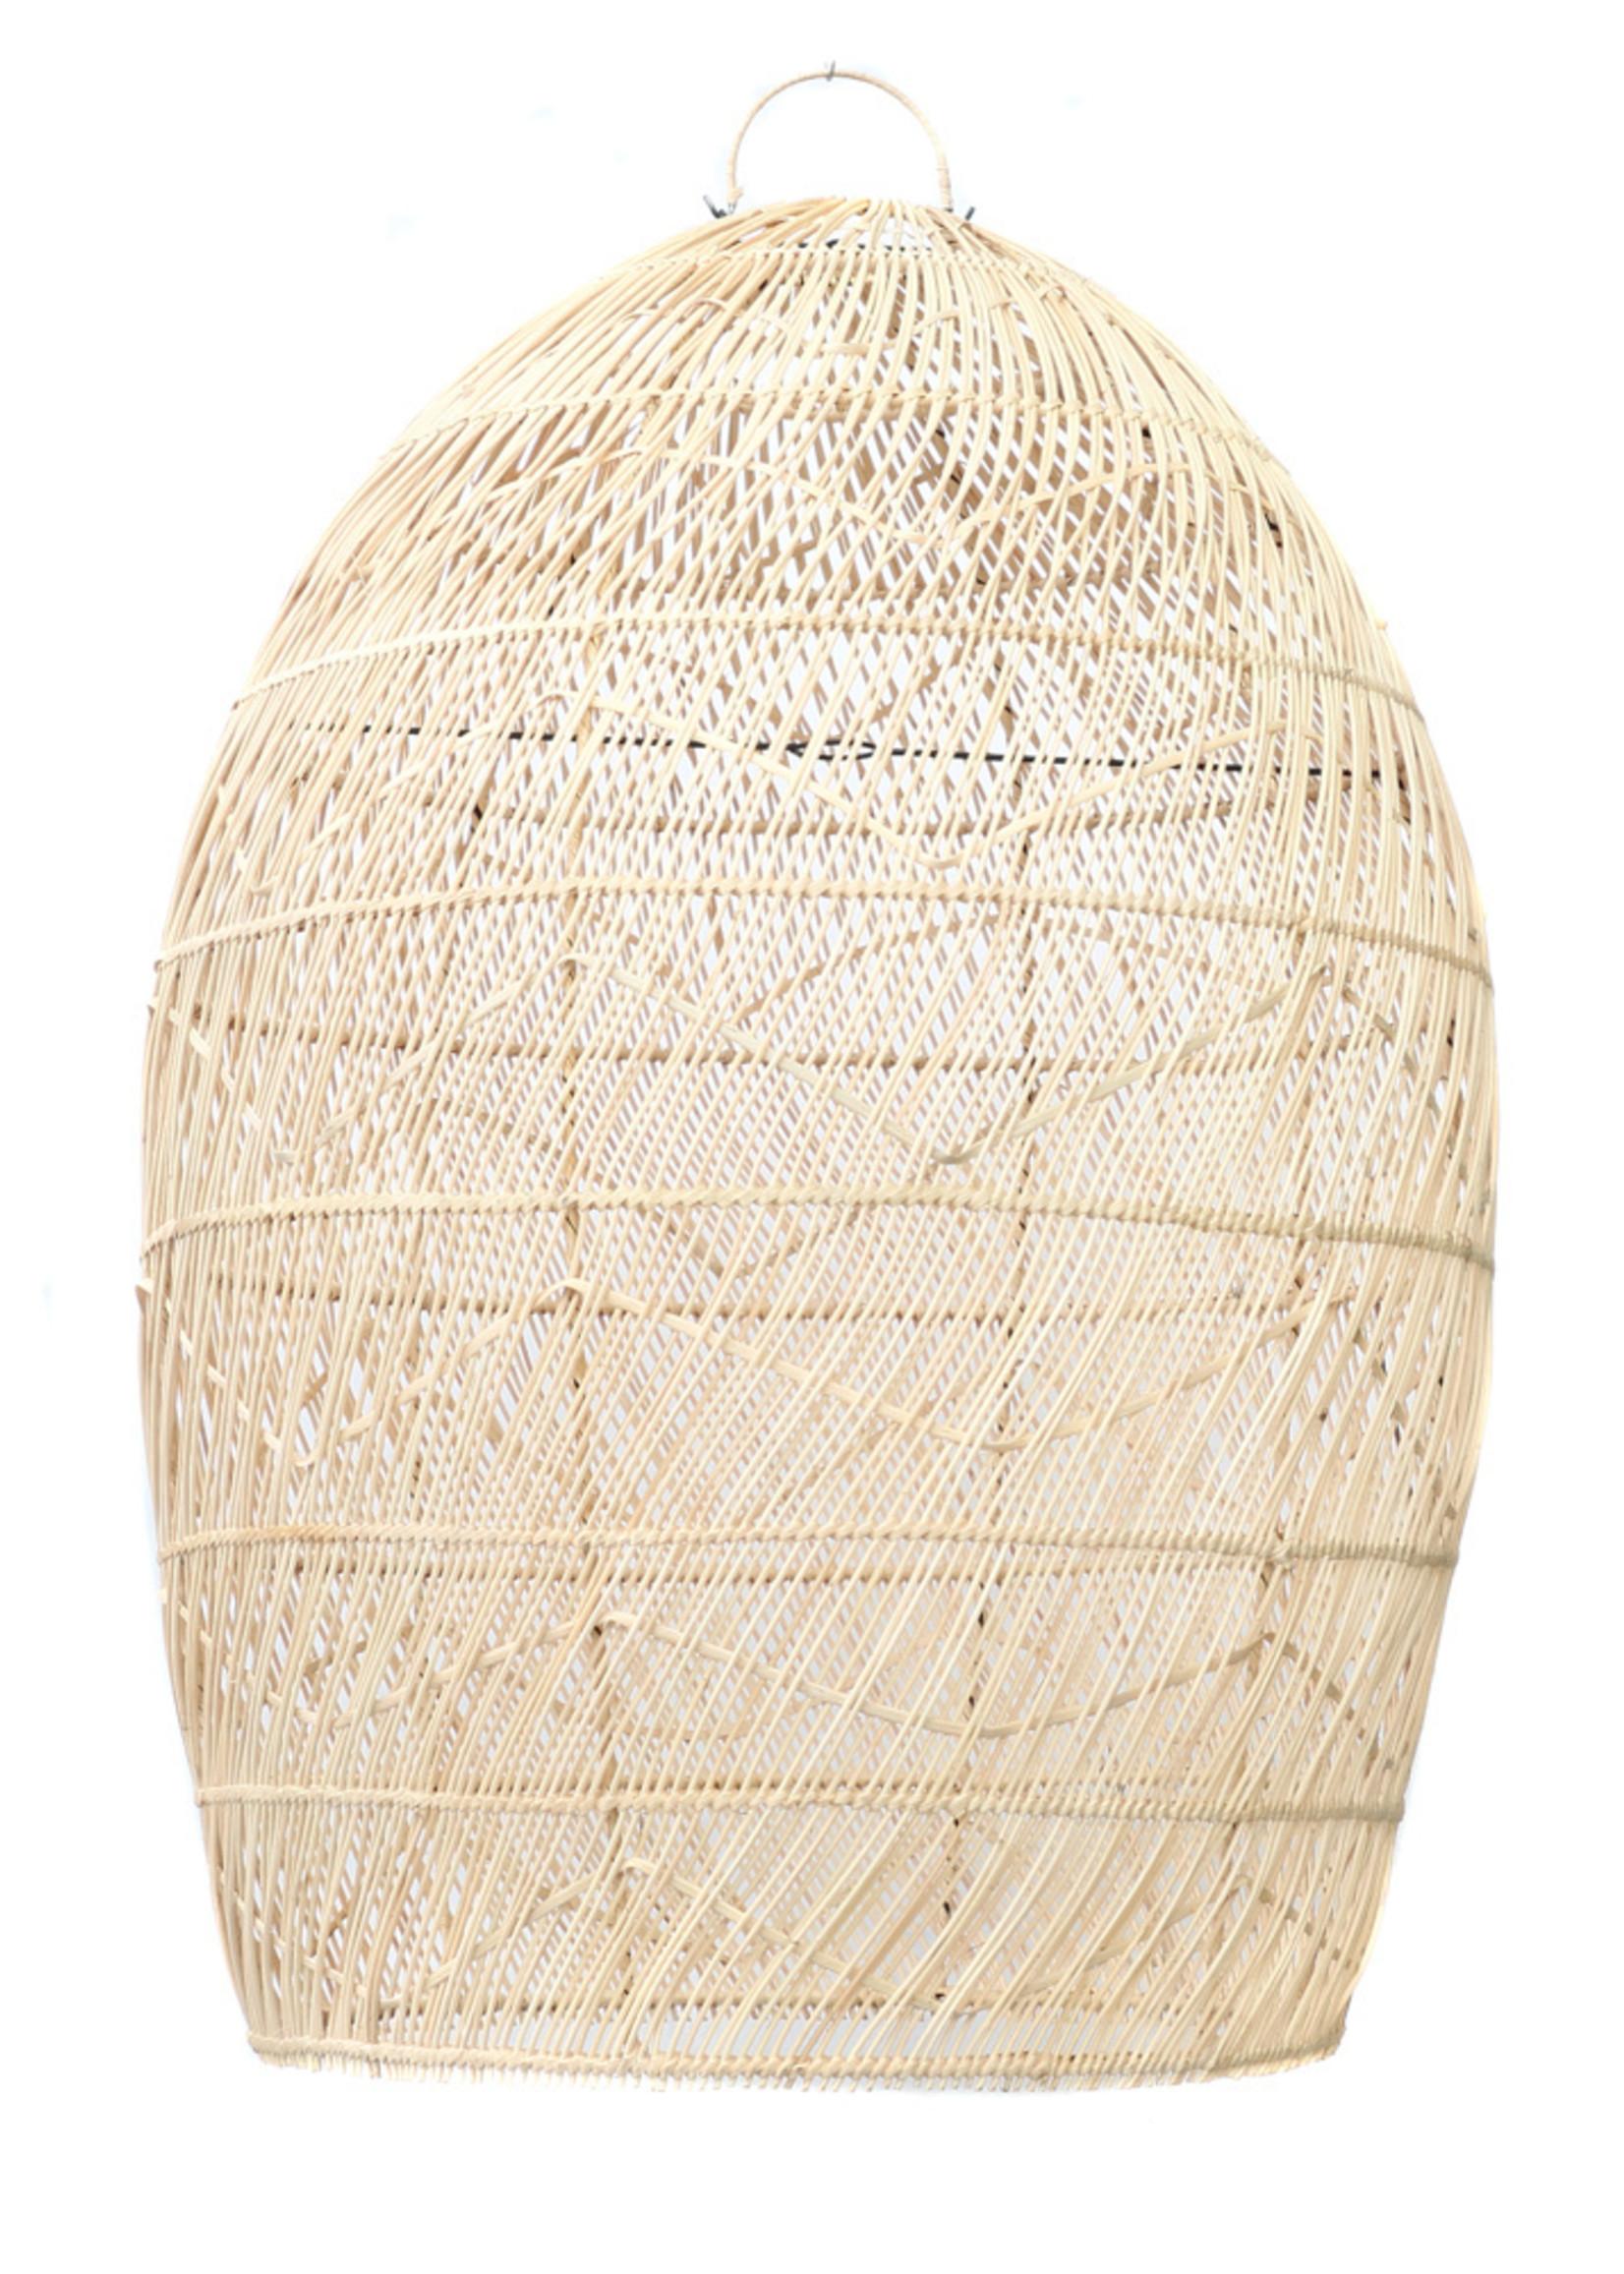 The Rattan Twister Pendant - Natural - 70x150